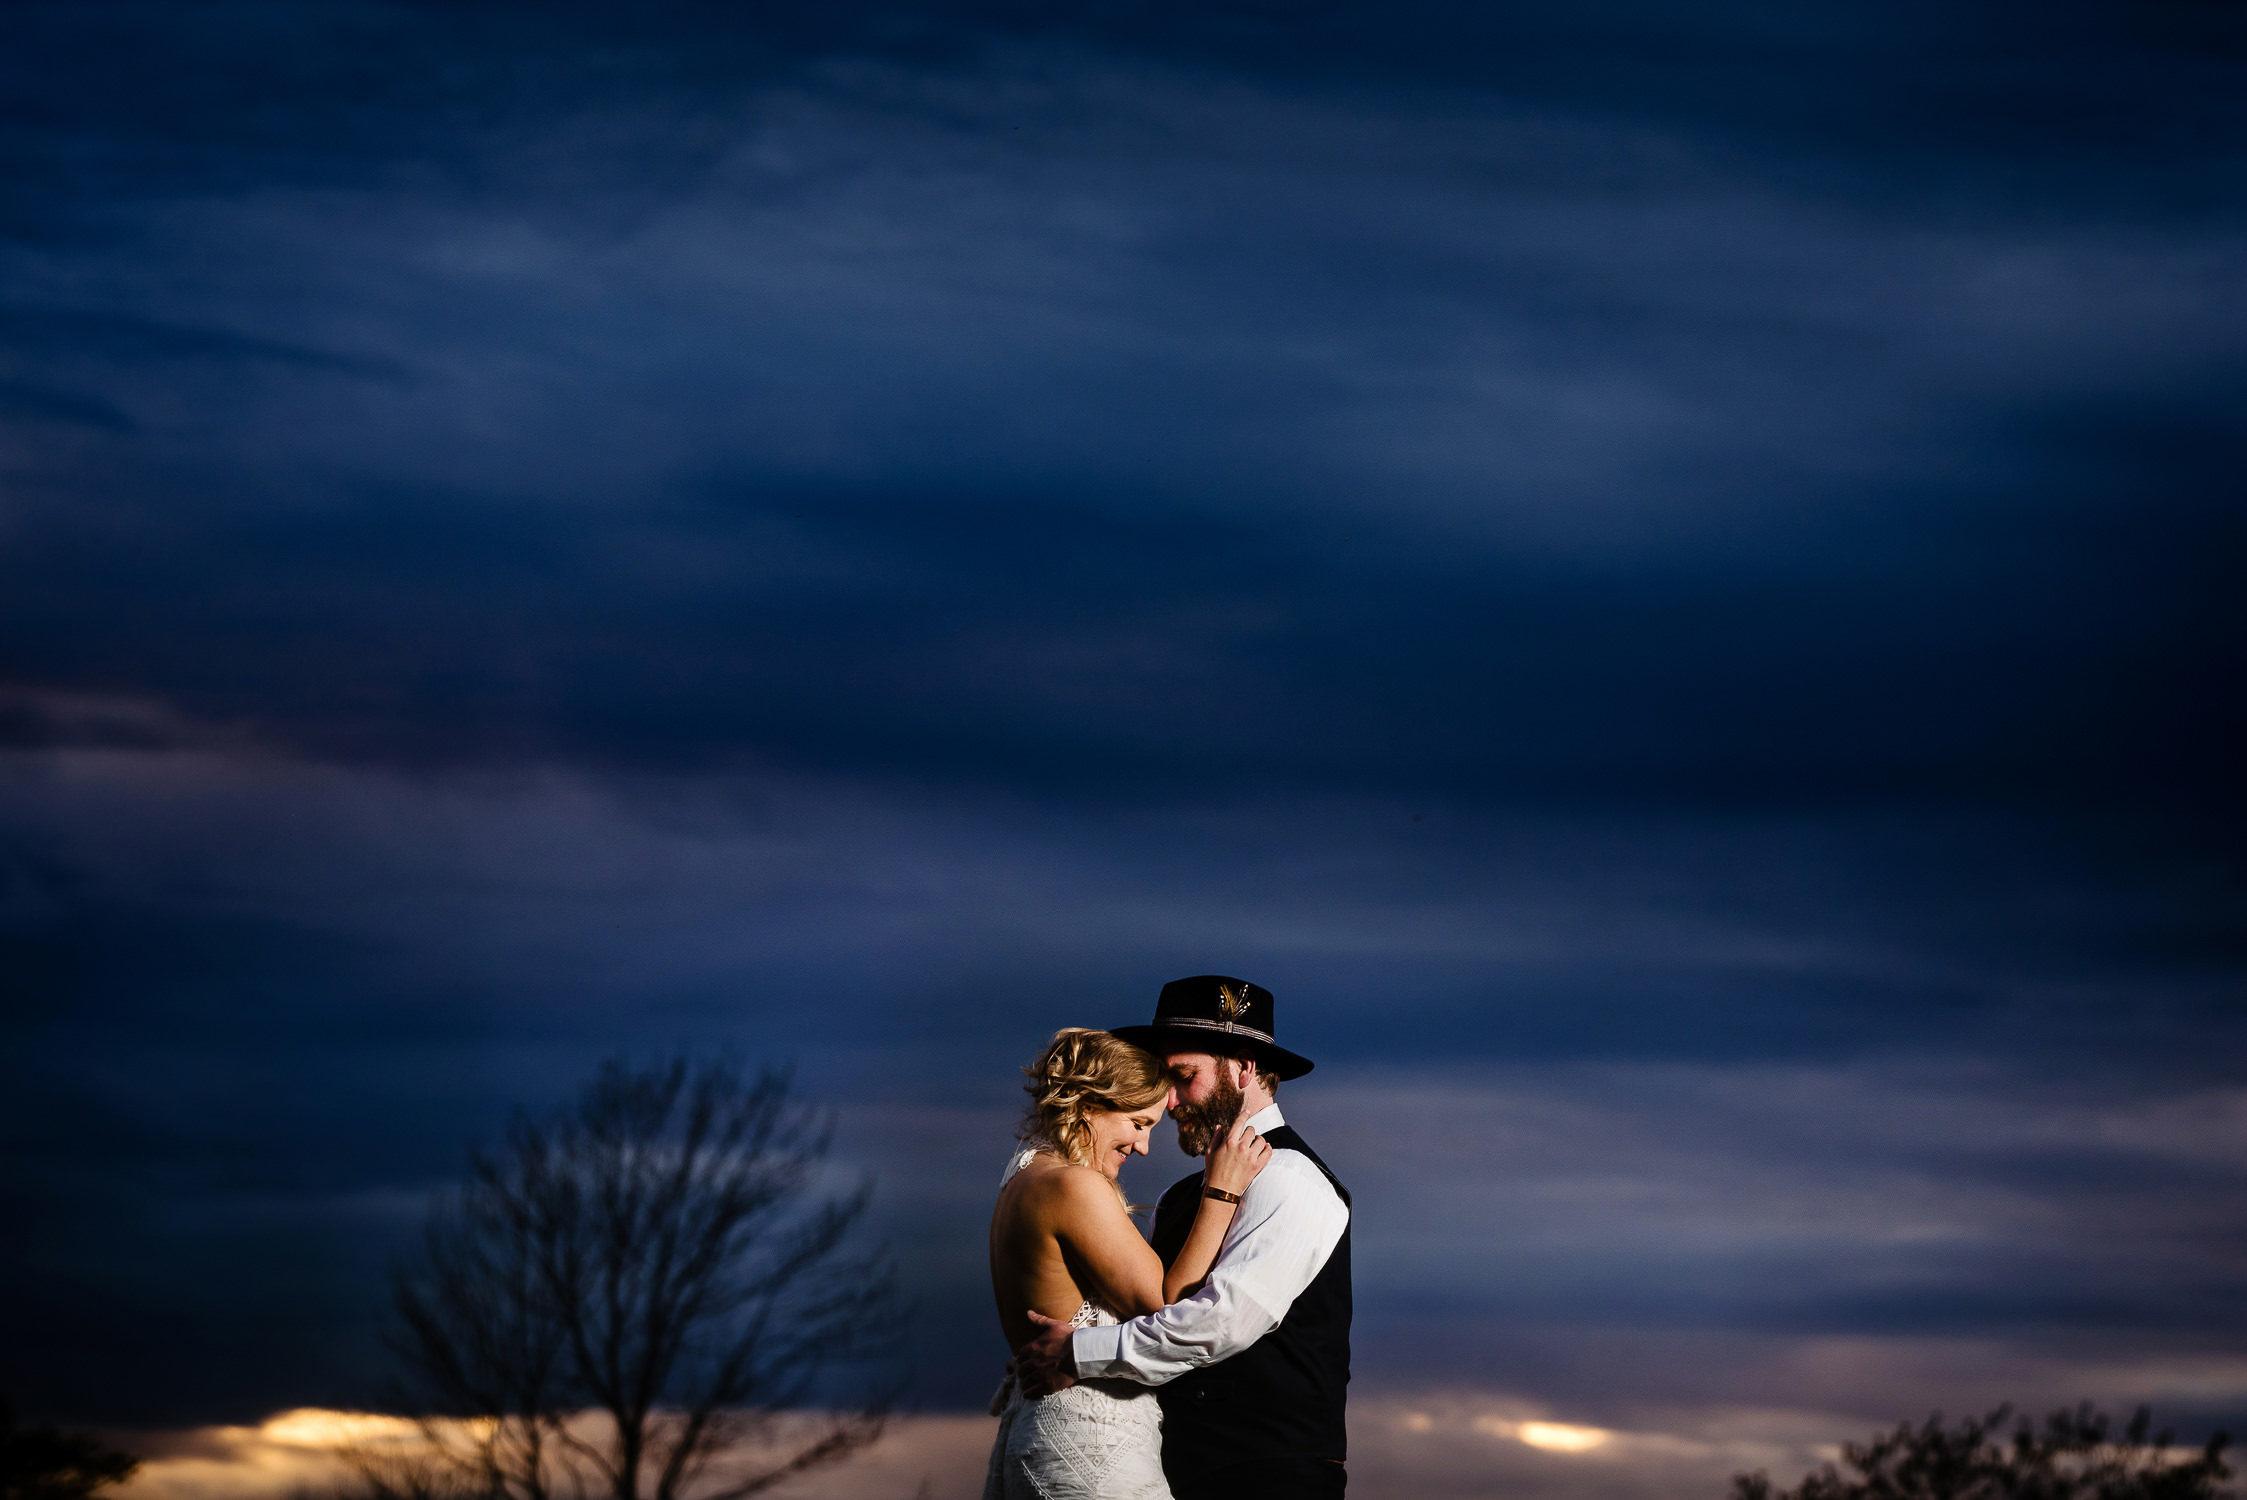 tourterelle-vermont-wedding-photographers-001-2-2247x1500.jpg